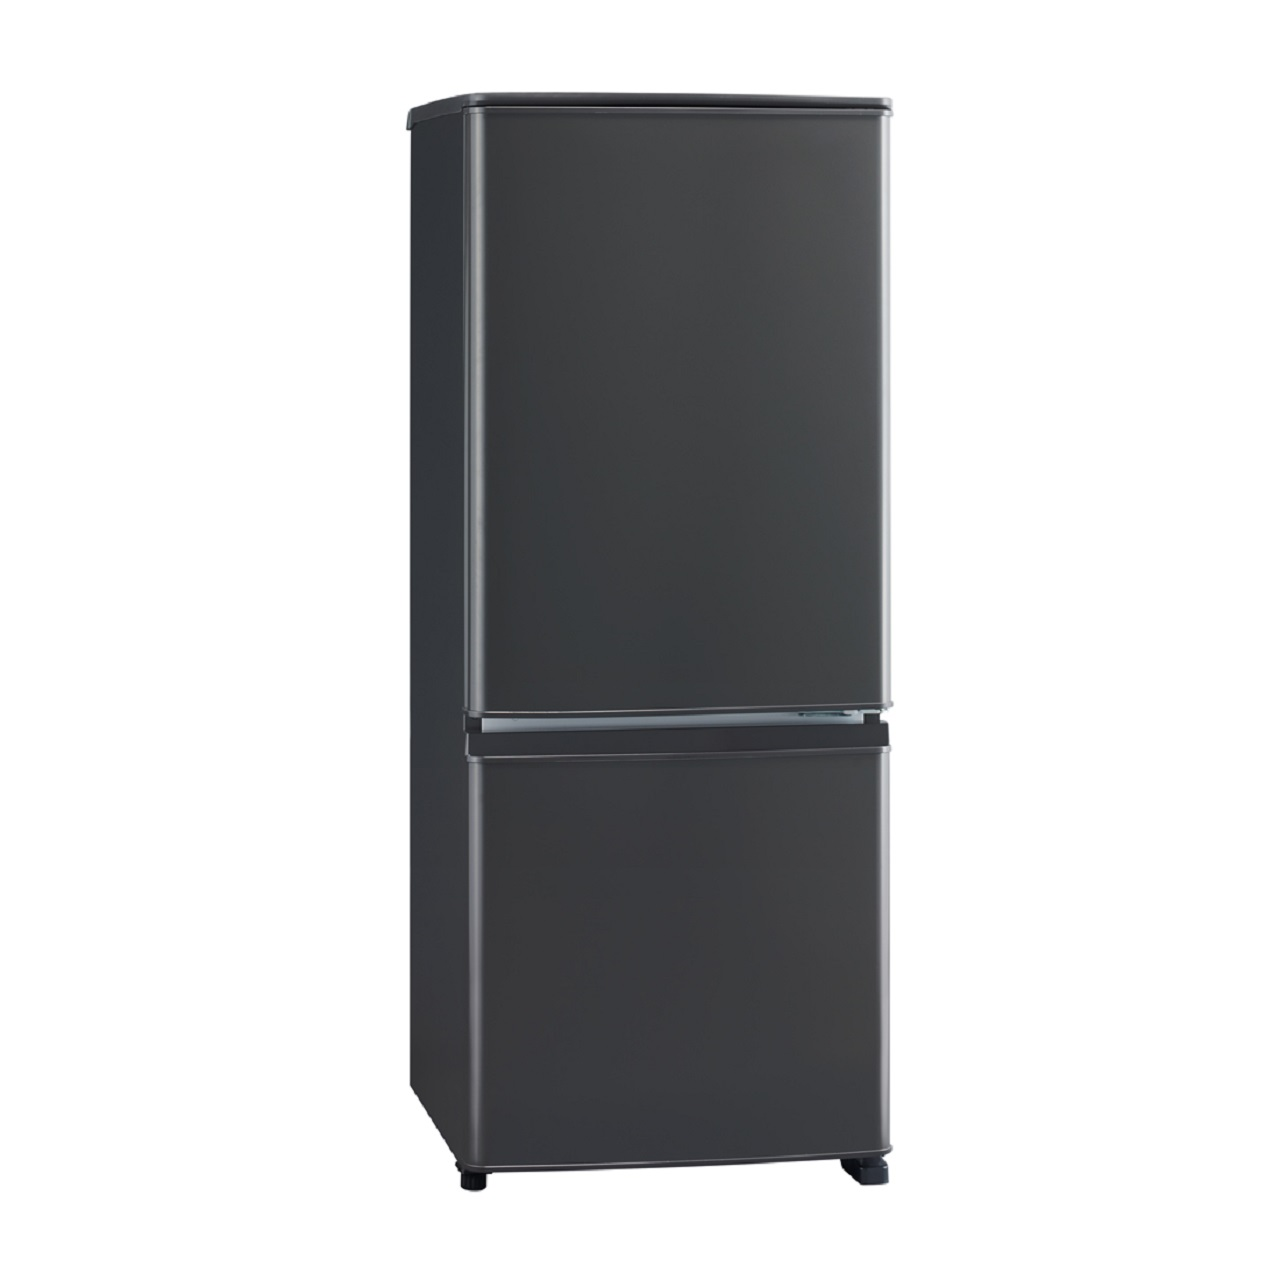 三菱MR-P15F冷蔵庫